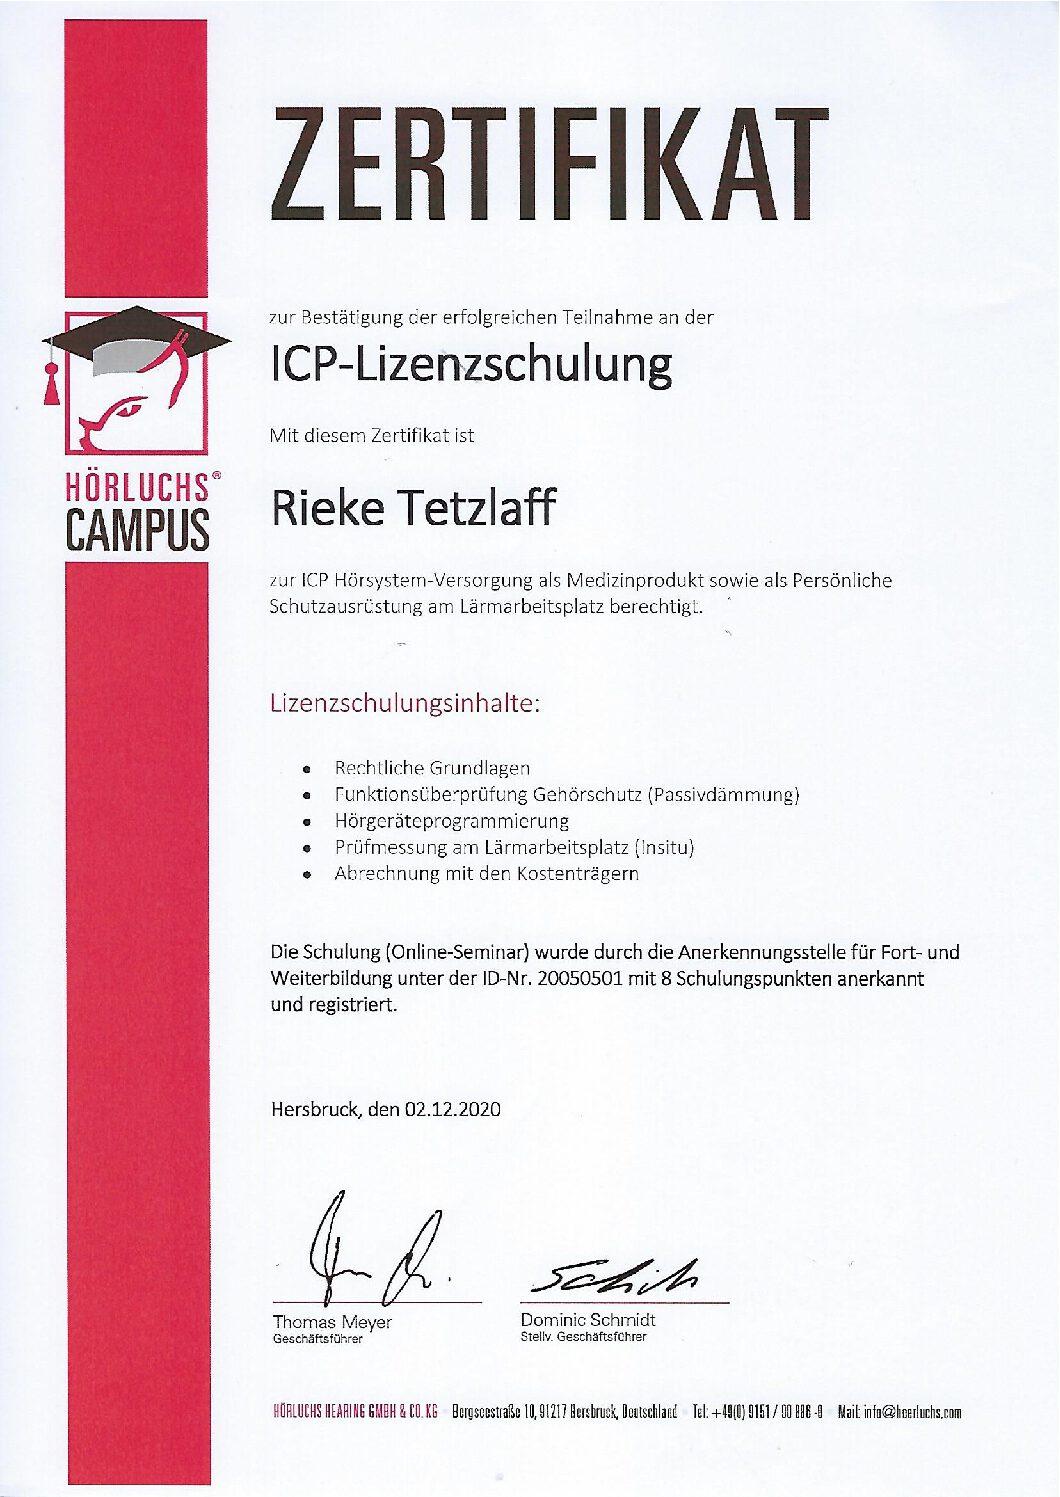 Hörluchs ICP Partner